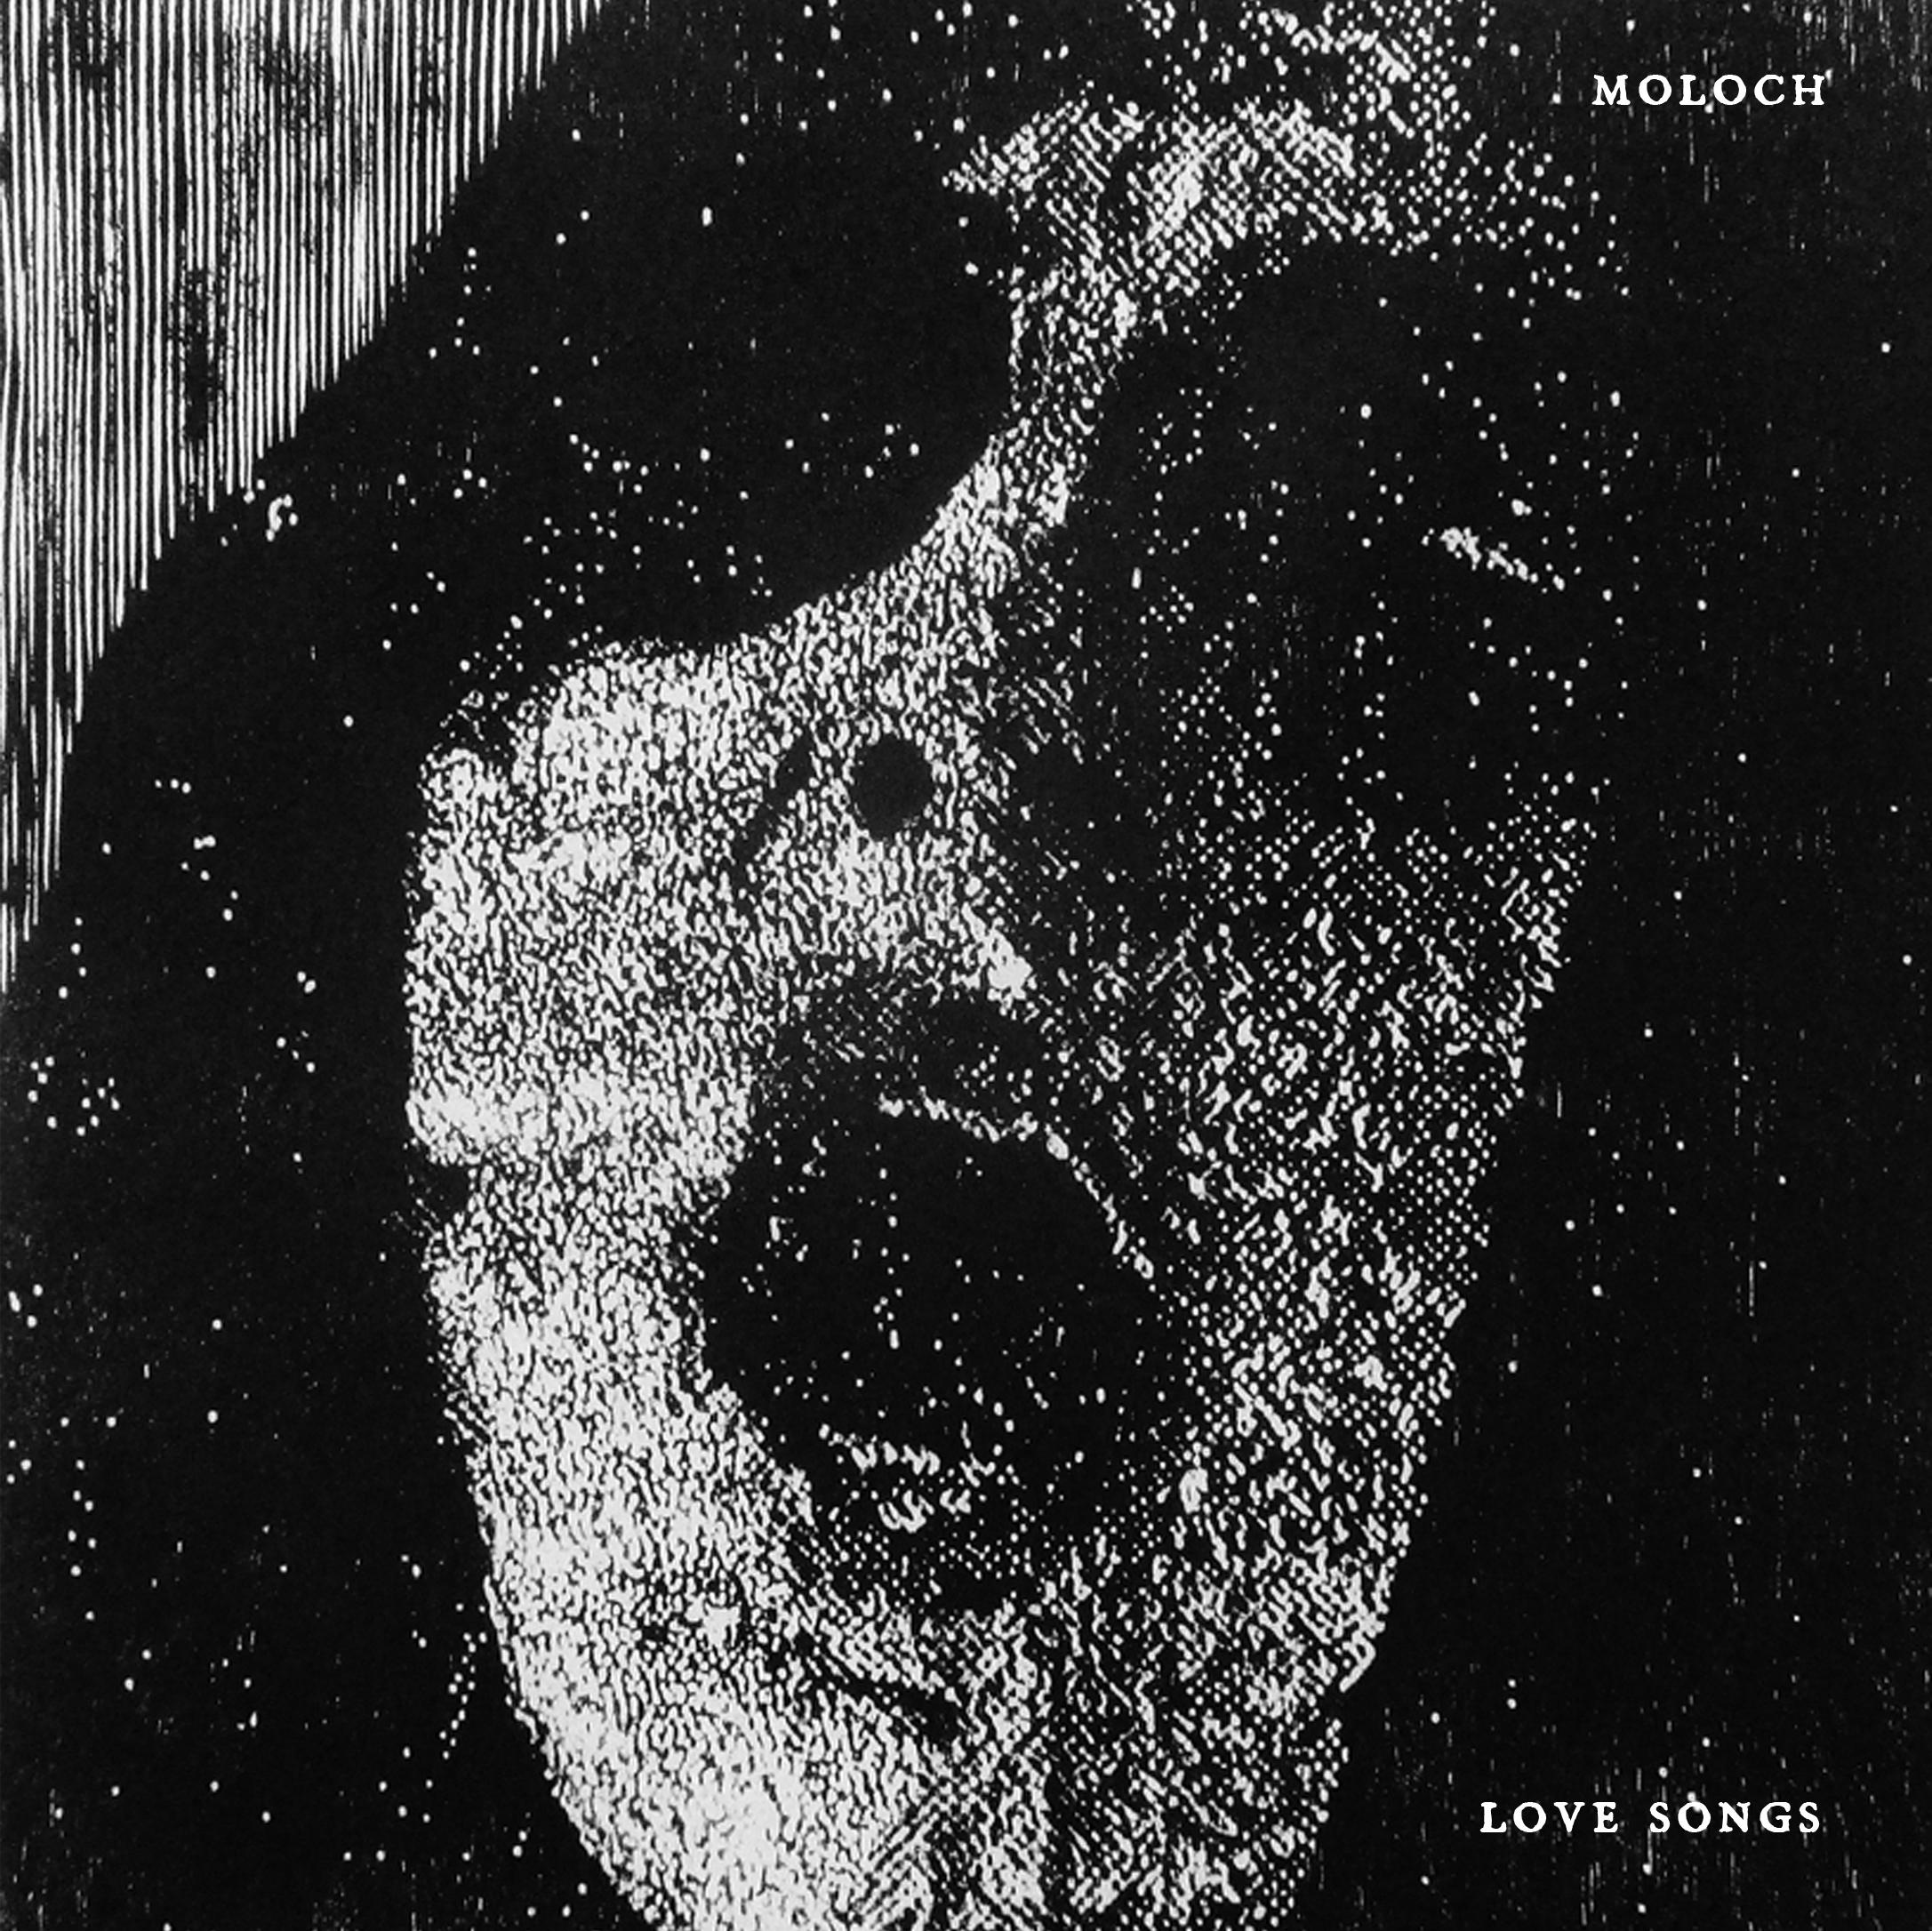 MOLOCH - LOVE SONGS 7